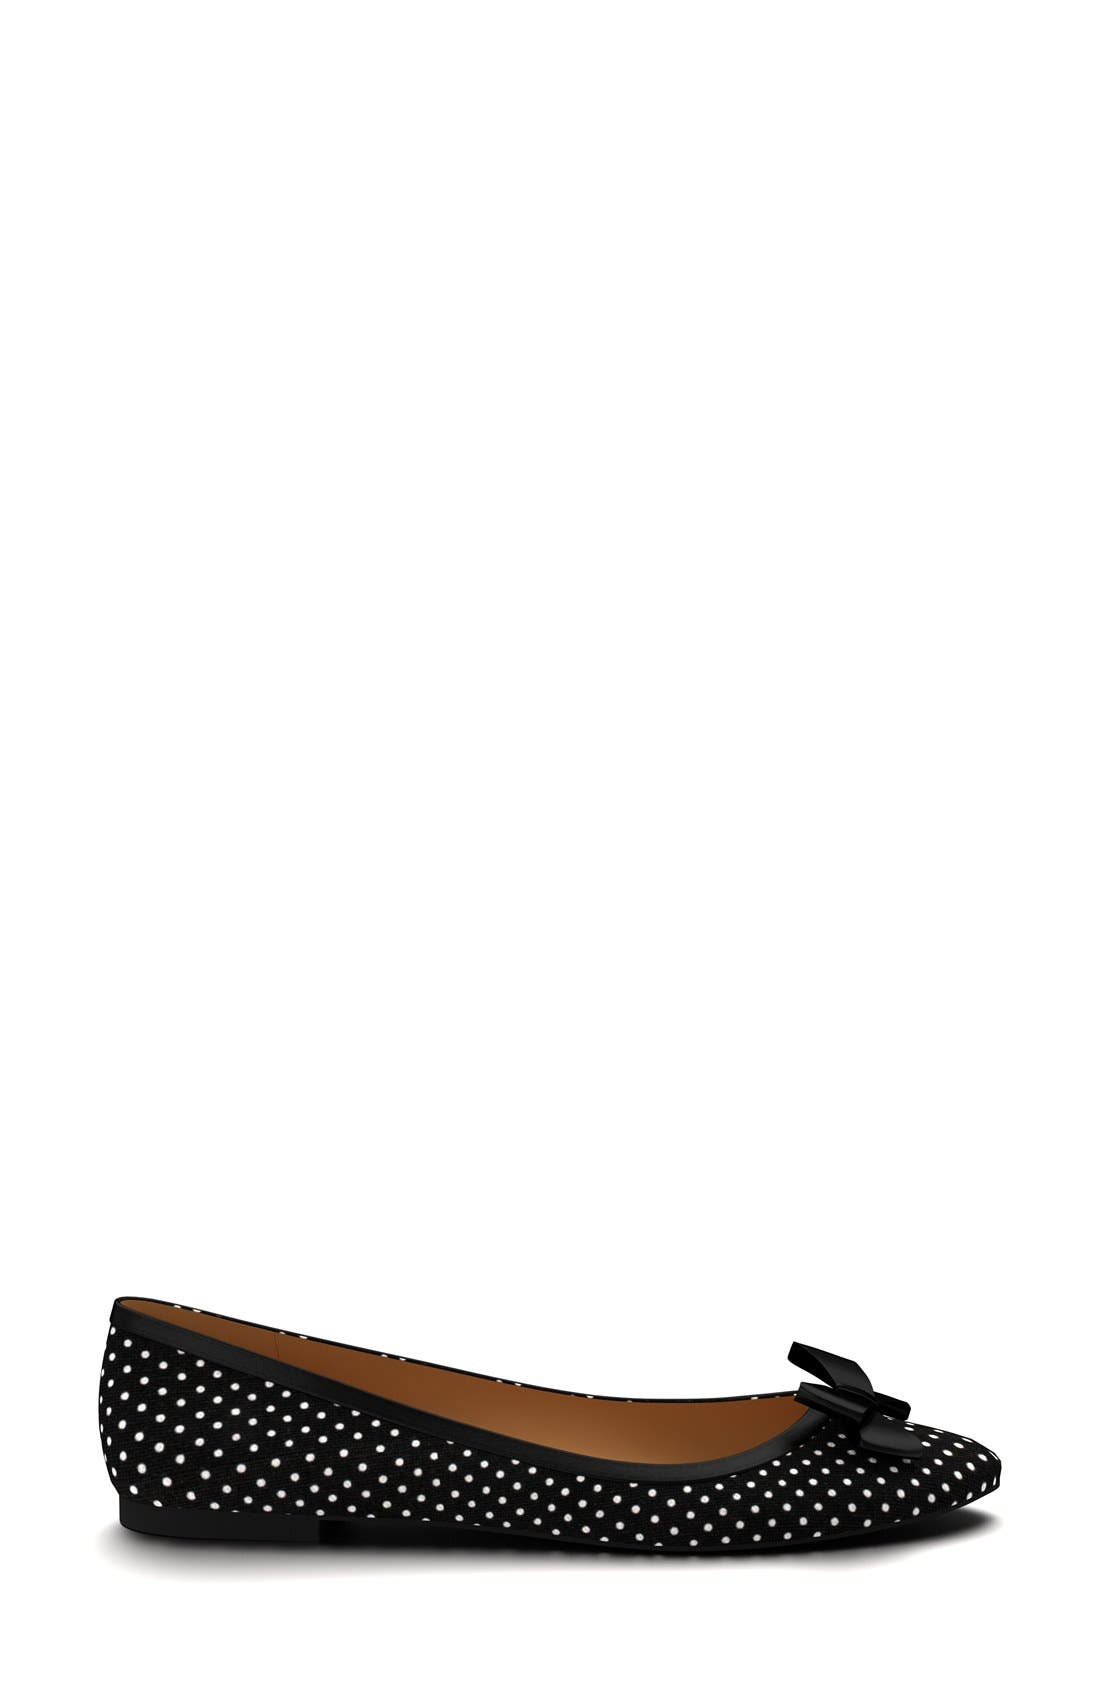 Alternate Image 3  - Shoes of Prey Polka Dot Ballet Flat (Women)